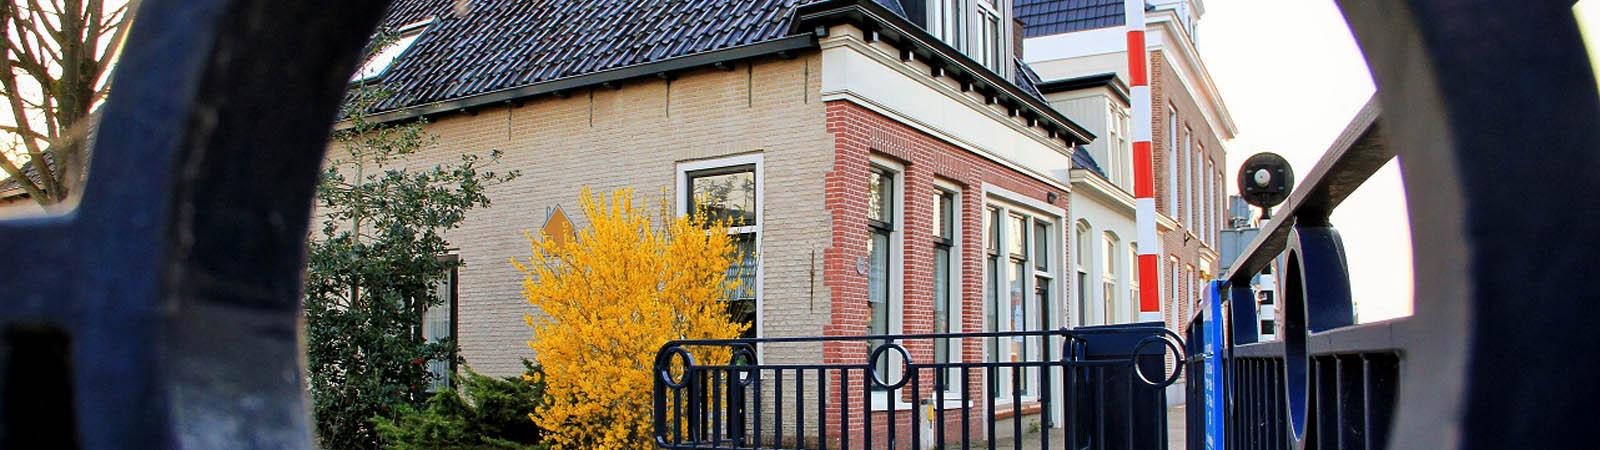 Aanloophuis Oer de Brêge